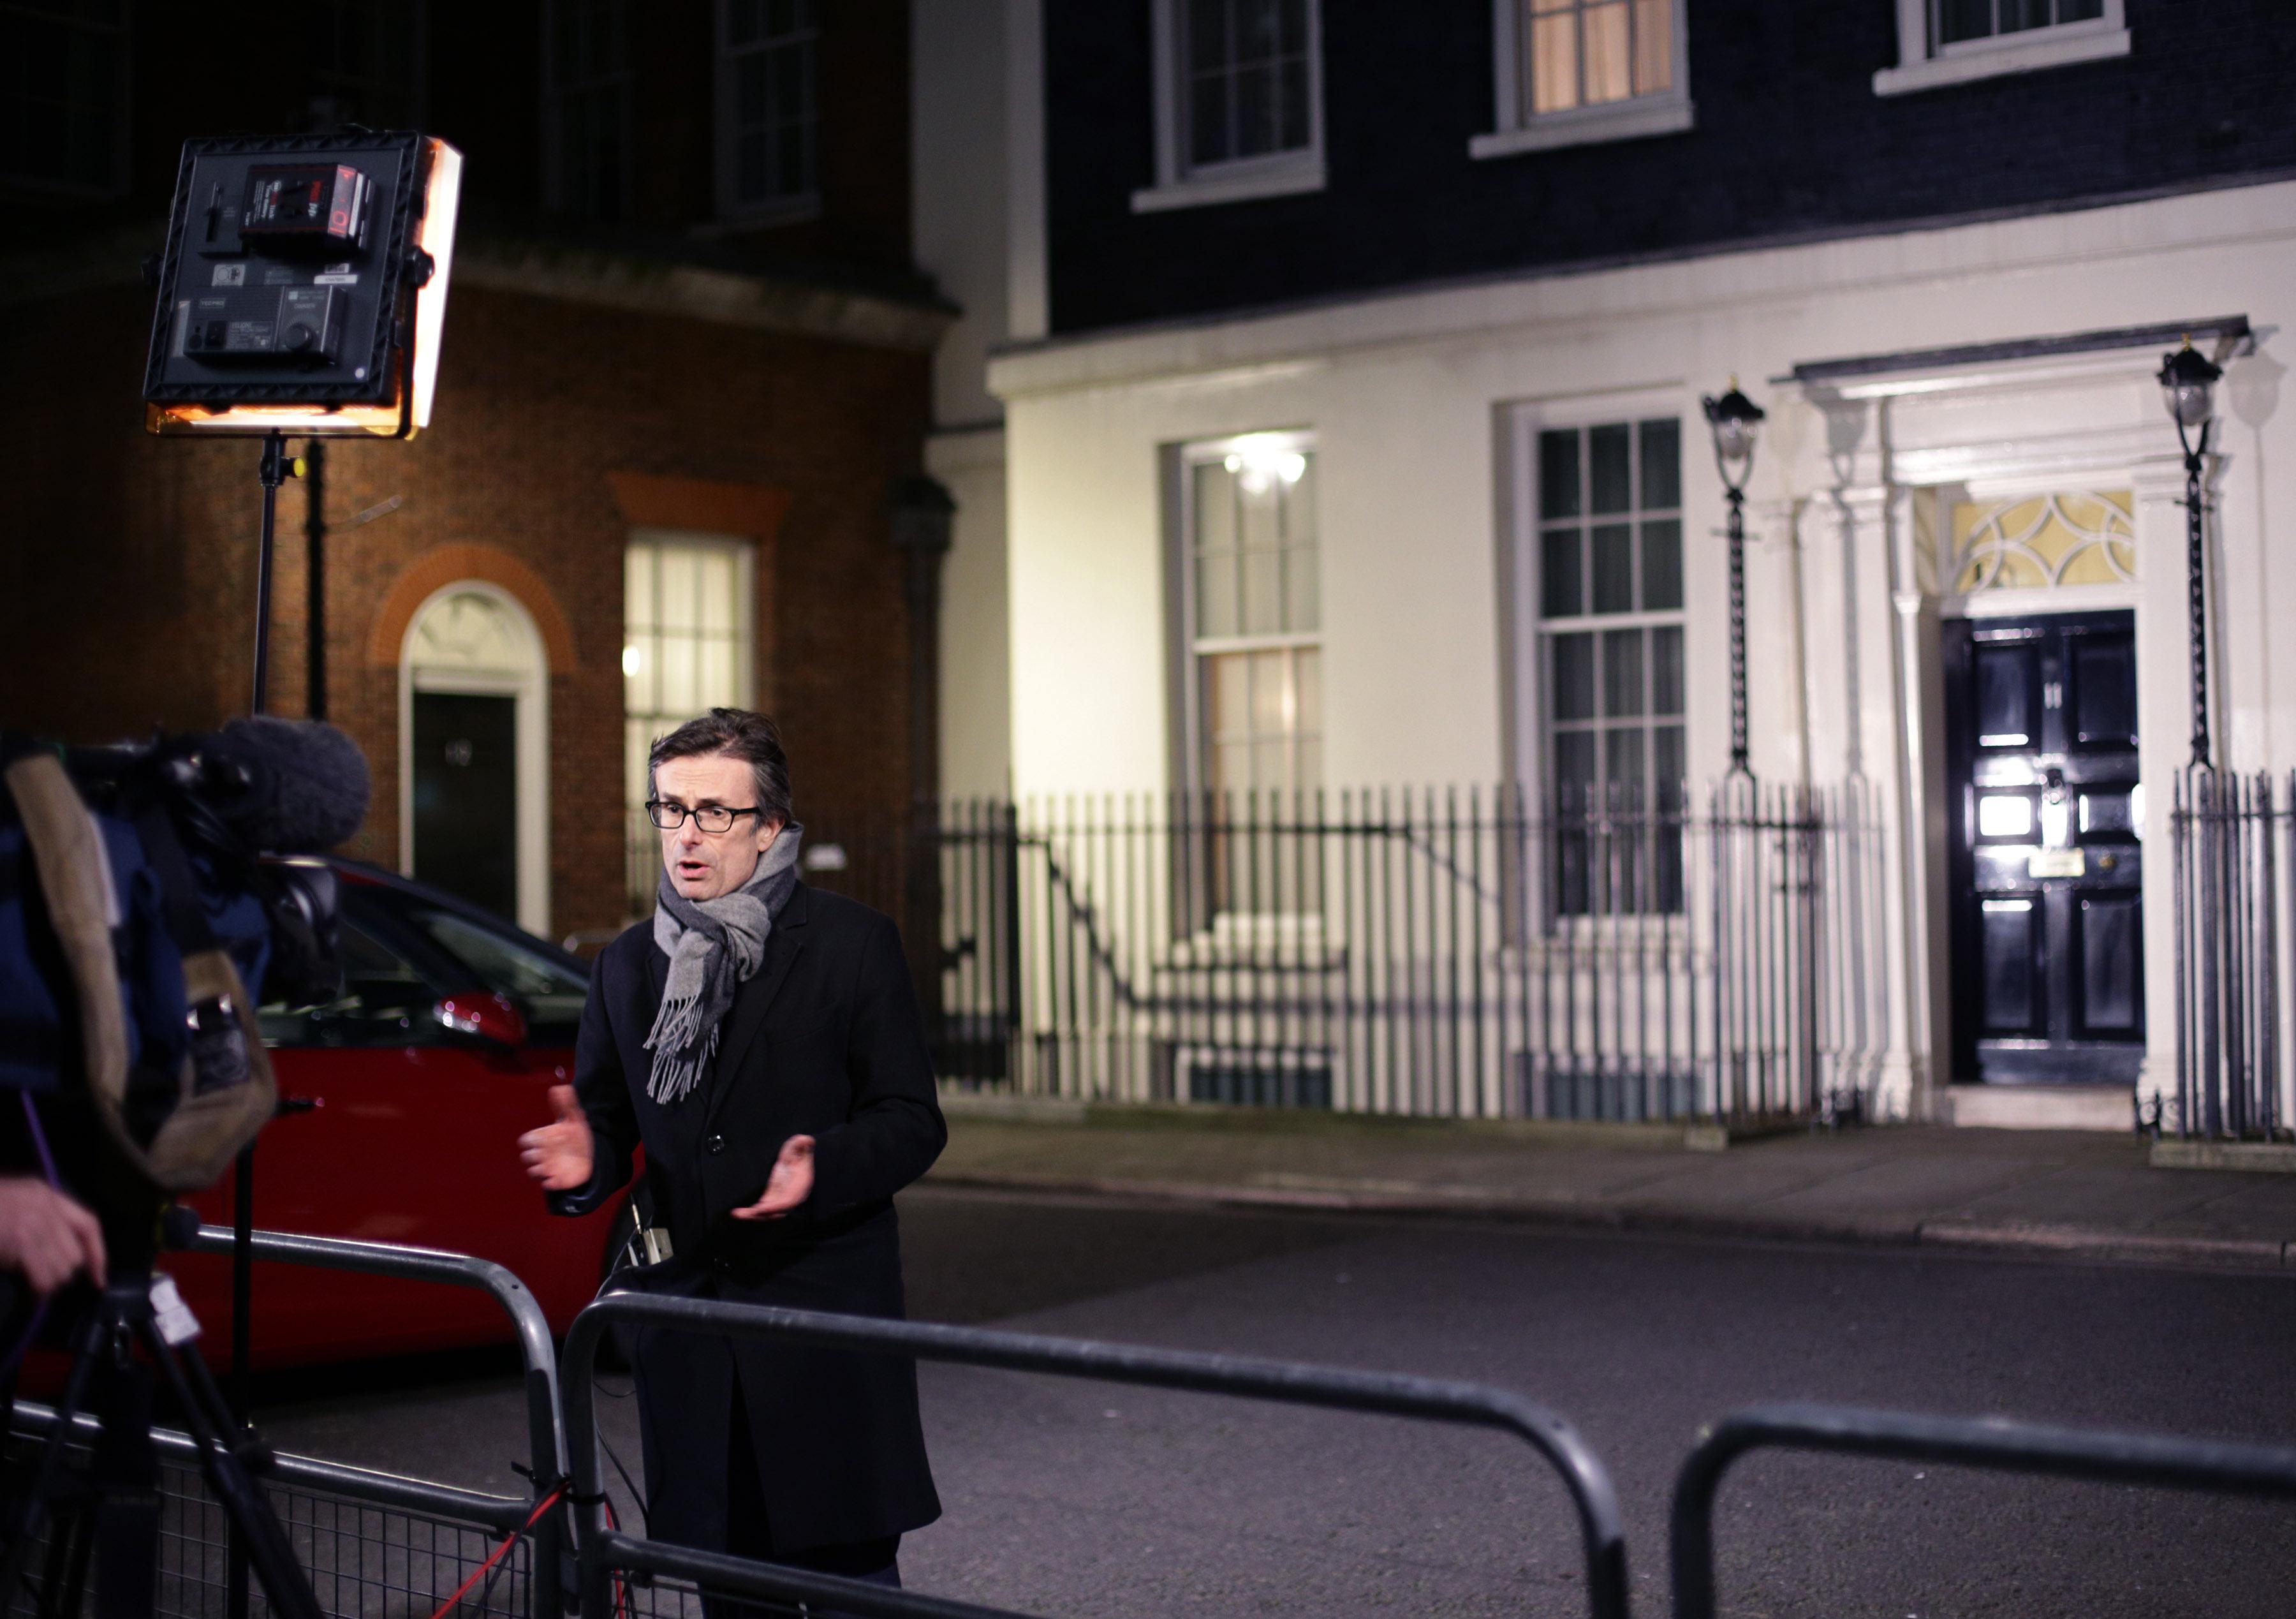 Robert Peston filming outside Downing Street